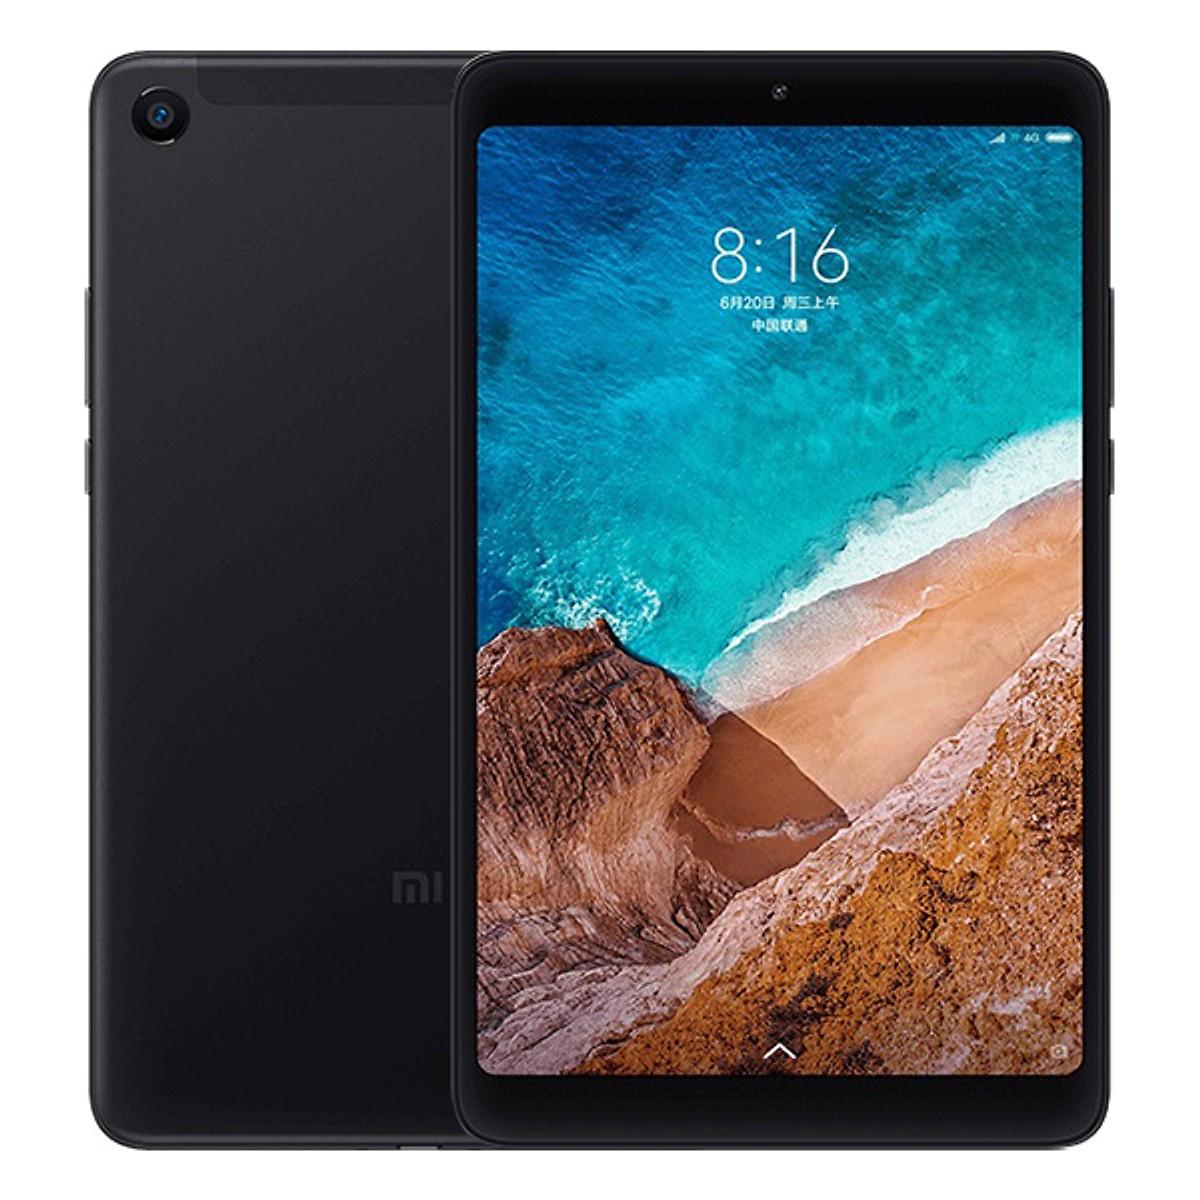 Máy tính bảng giá rẻ Xiaomi Mi Pad 4 32GB